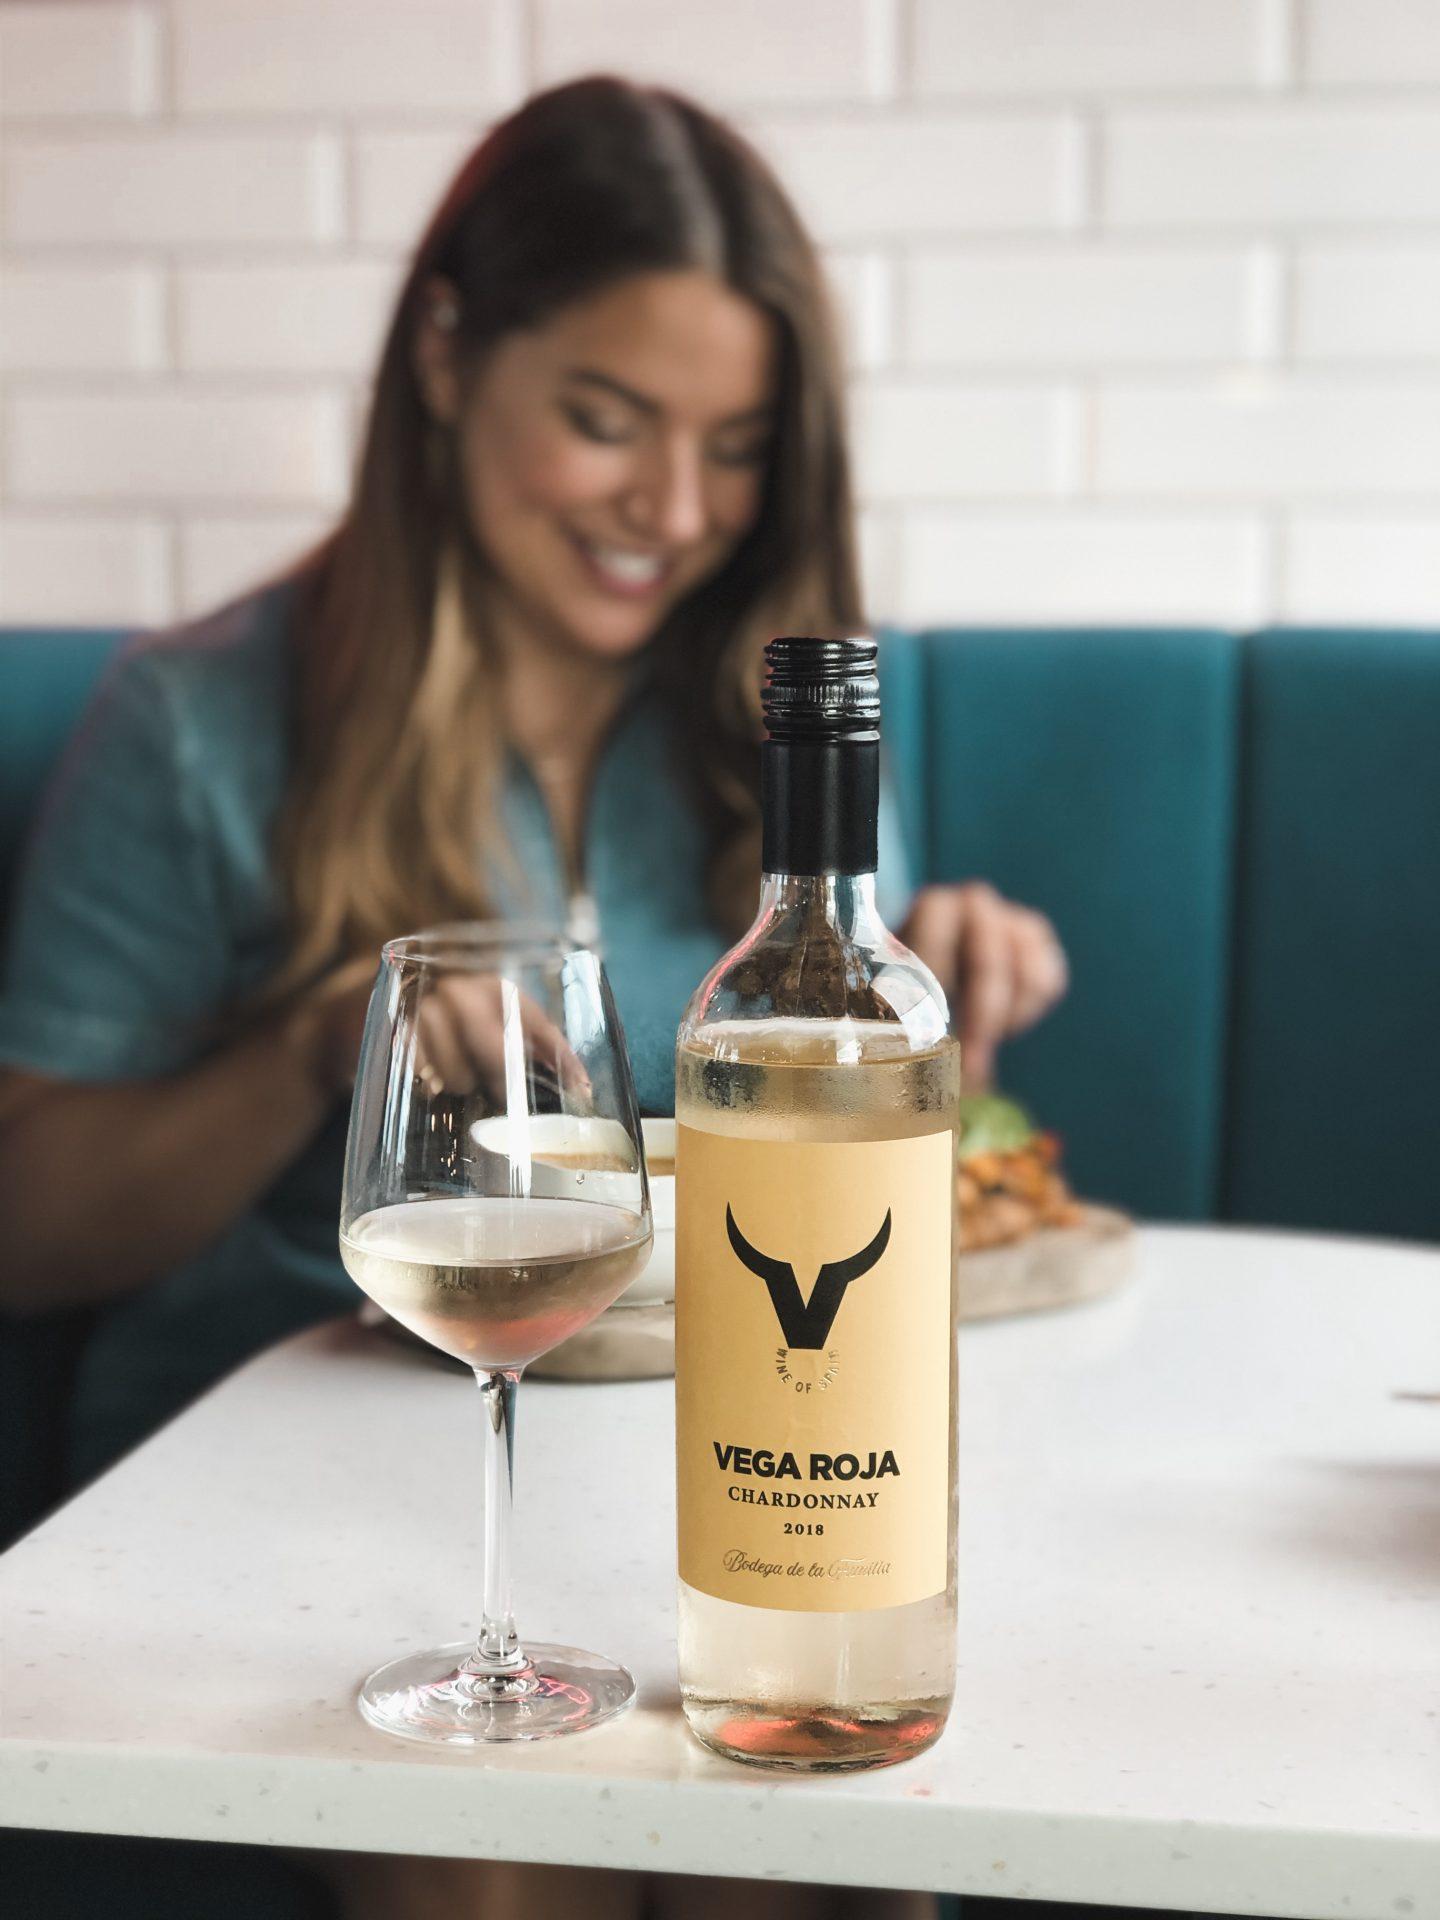 Nadia El Ferdaoussi Centra Vega Voja Chardonnay